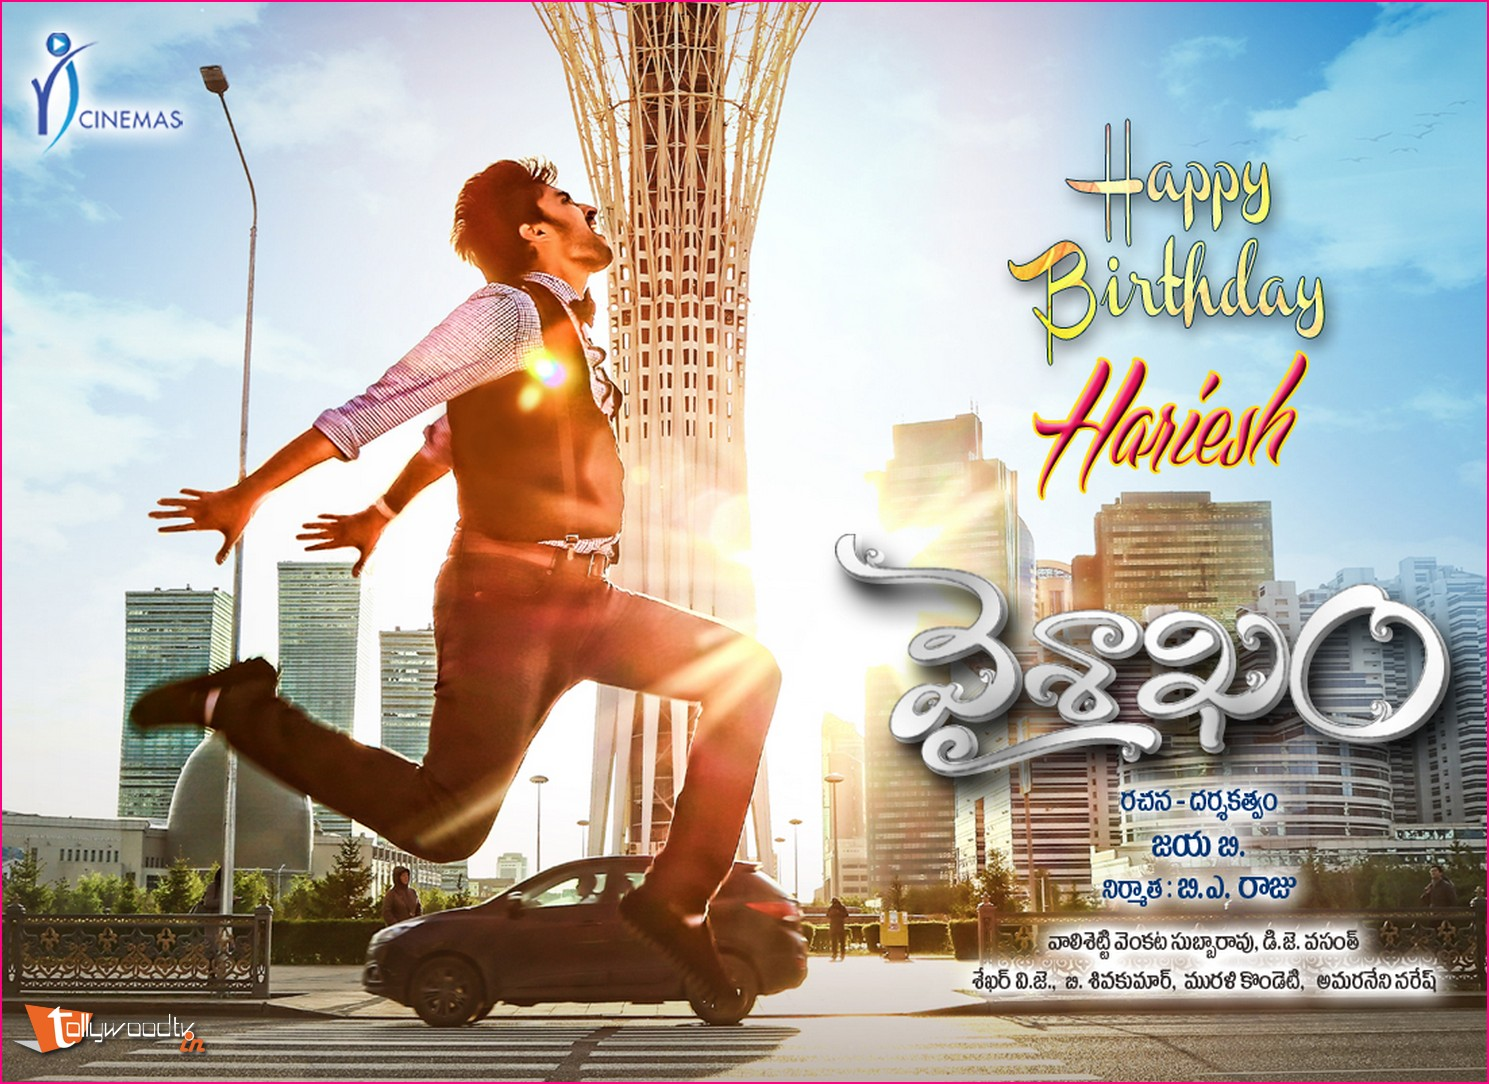 Hariesh Birthday Spl Posters-HQ-Photo-9